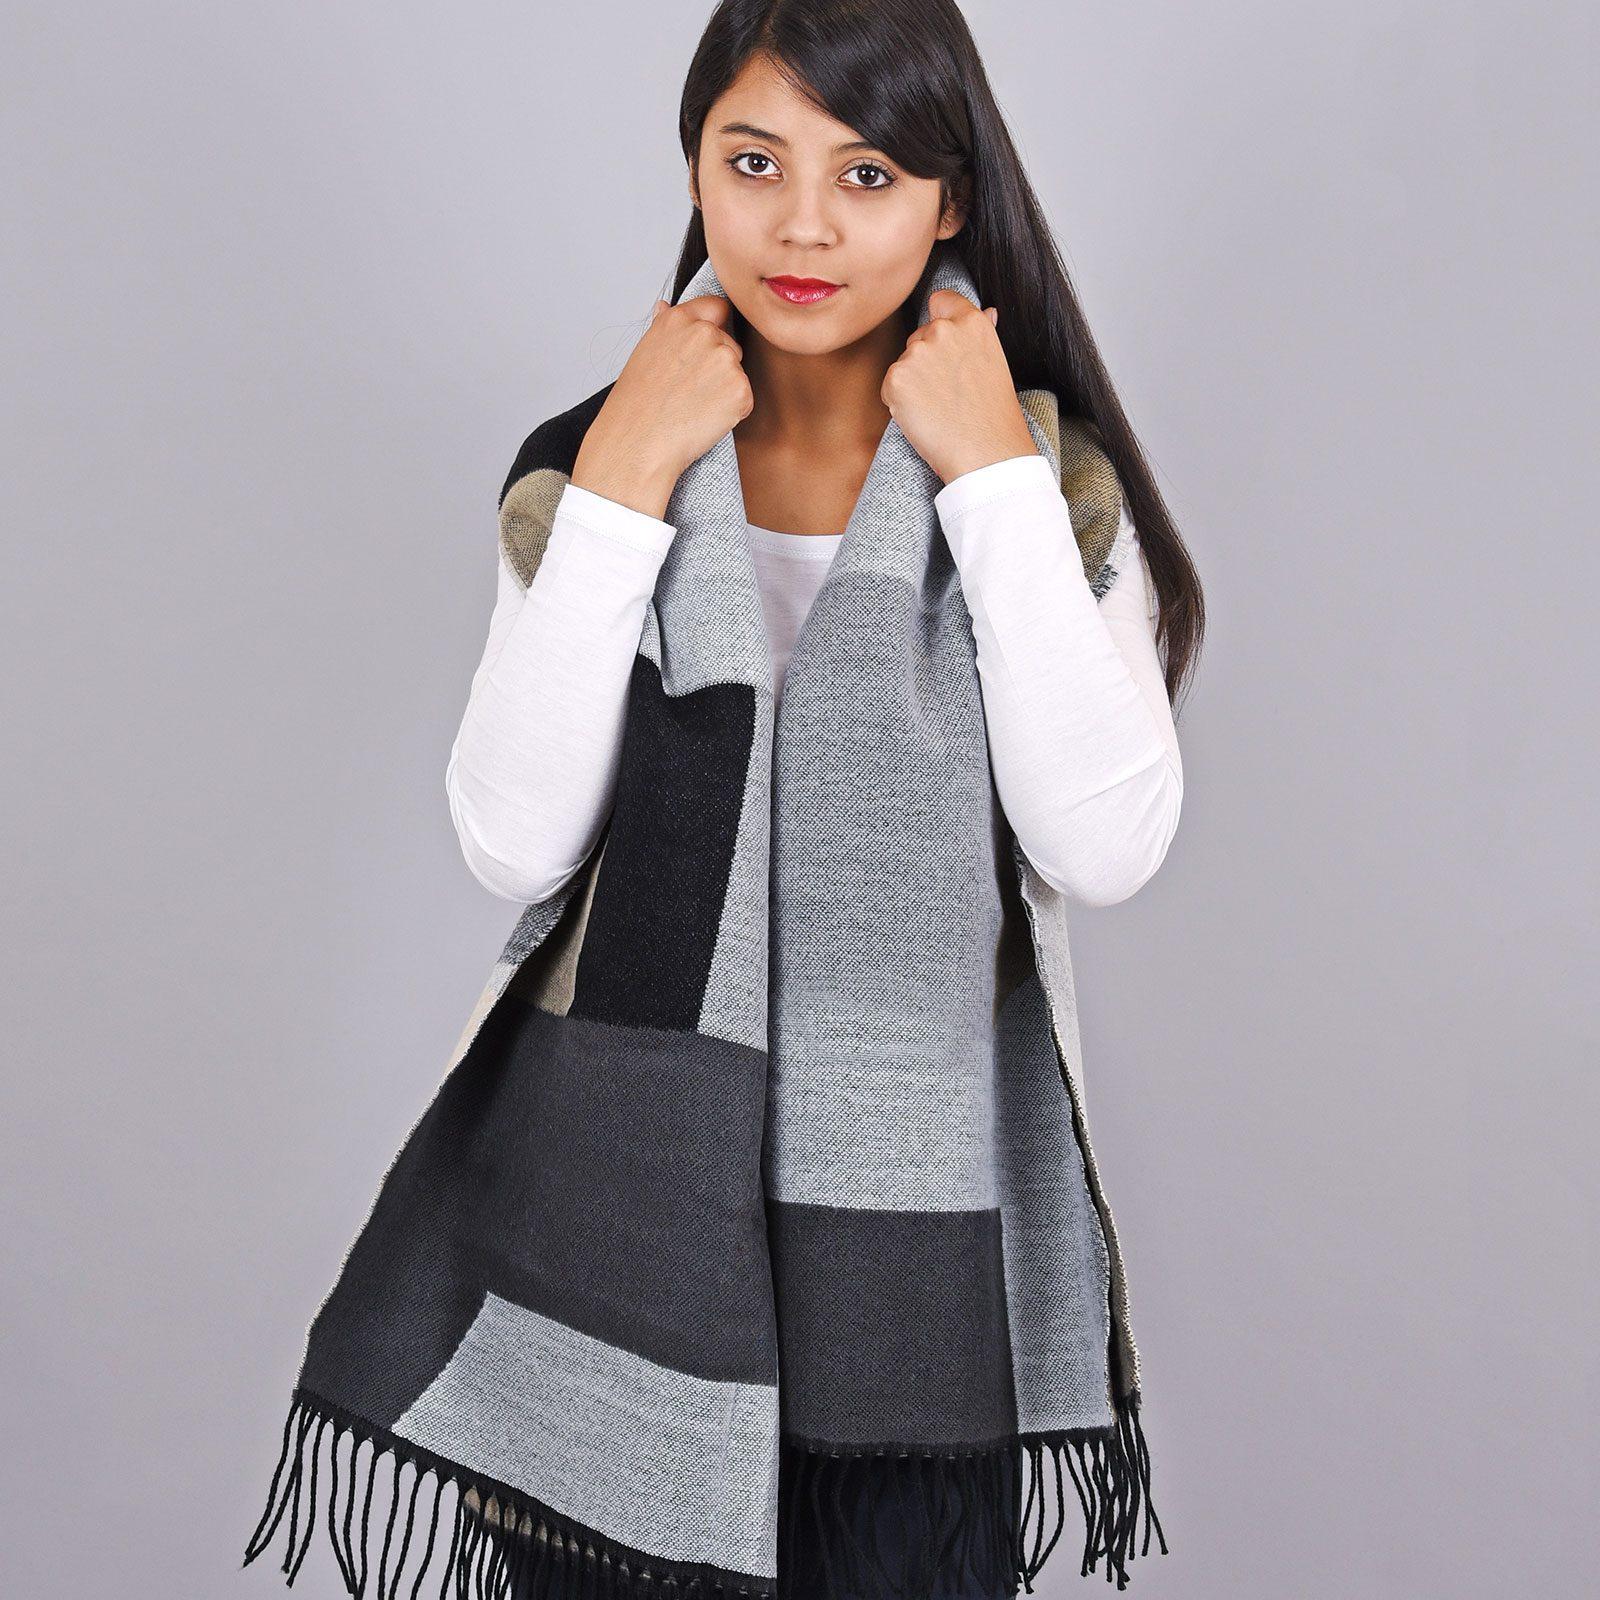 http://lookbook.allee-du-foulard.fr/wp-content/uploads/2018/11/AT-03453-VF16-2-chale-epais-patchwork-gris-noir-1600x1600.jpg